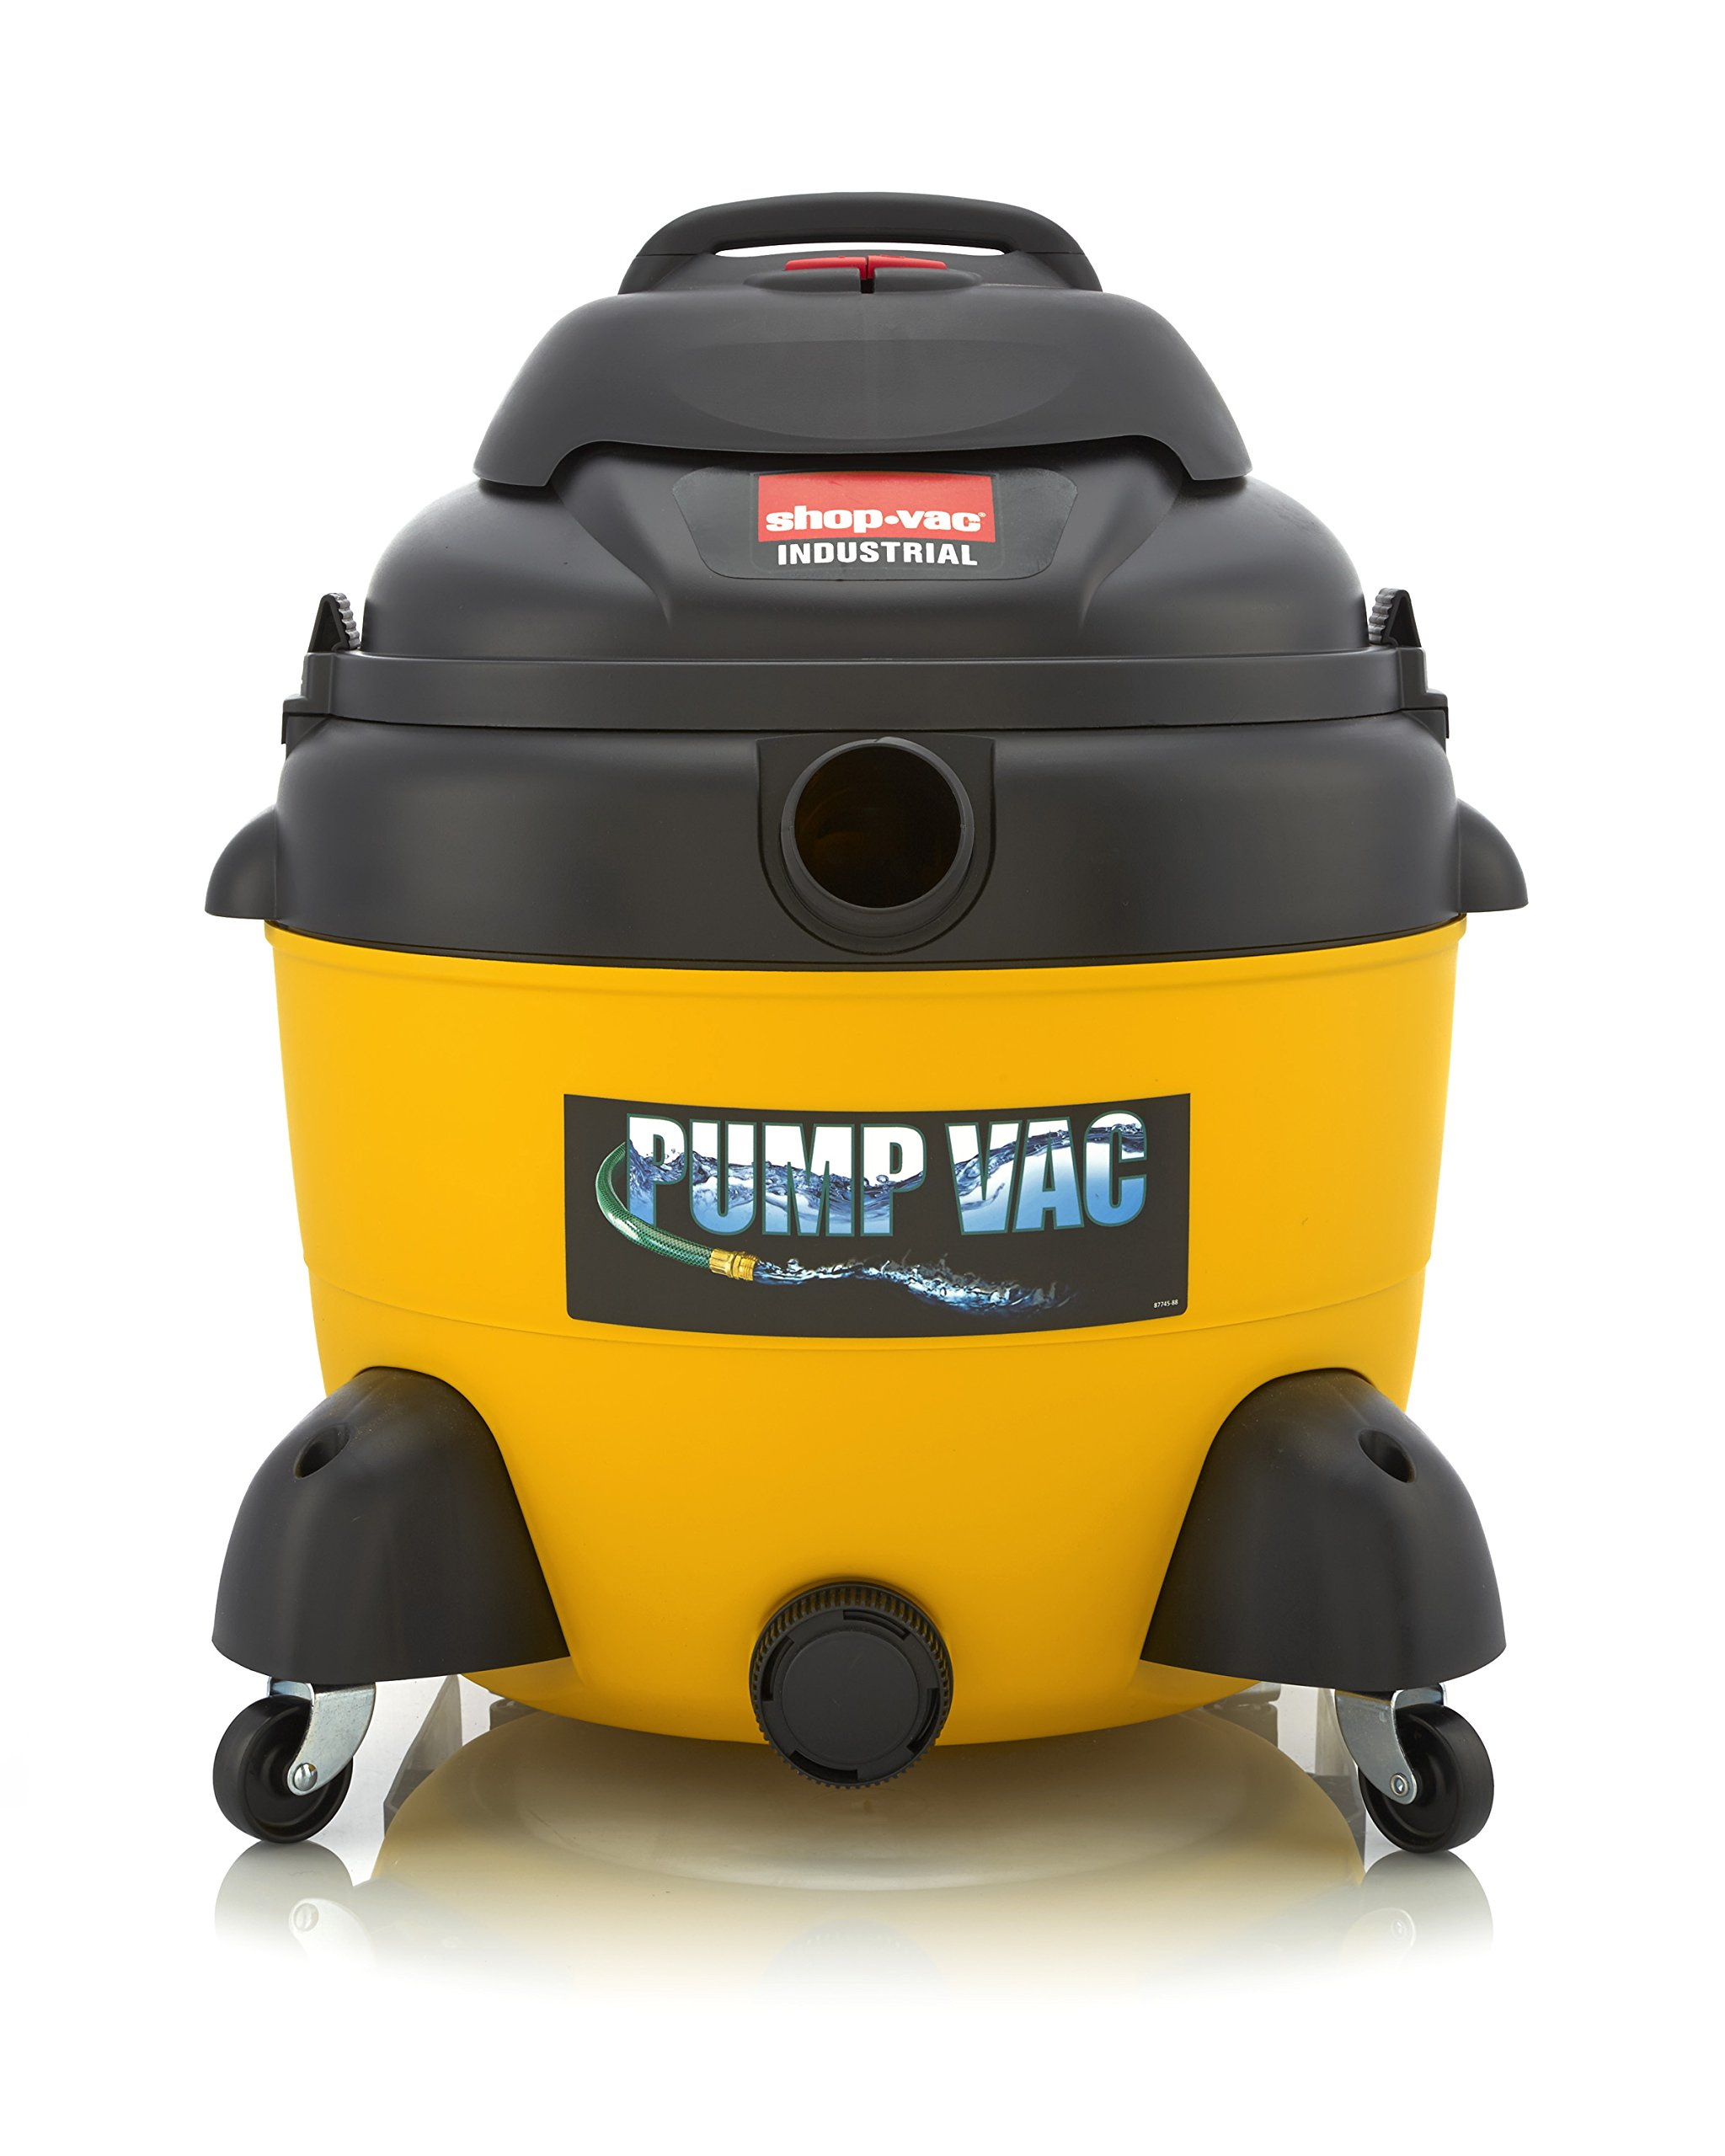 Shop-Vac 9604610 6.5 Peak HP wet Dry Vacuum with Built in Pump, 16-Gallon by Shop-Vac (Image #3)